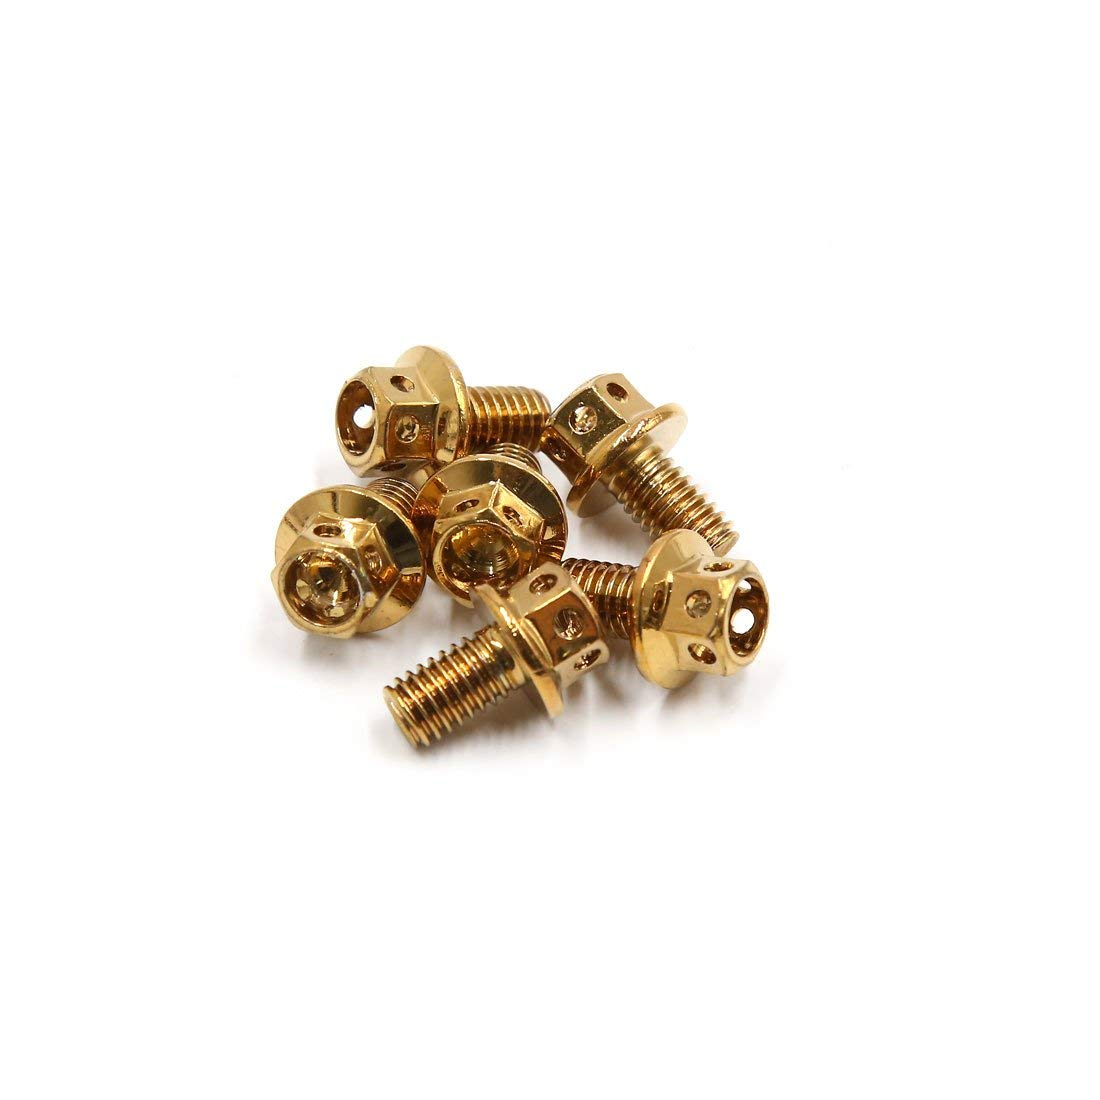 uxcell 6Pcs Gold Tone Titanium Alloy Motorcycle Bolts Screws Fastener M6 x 10mm